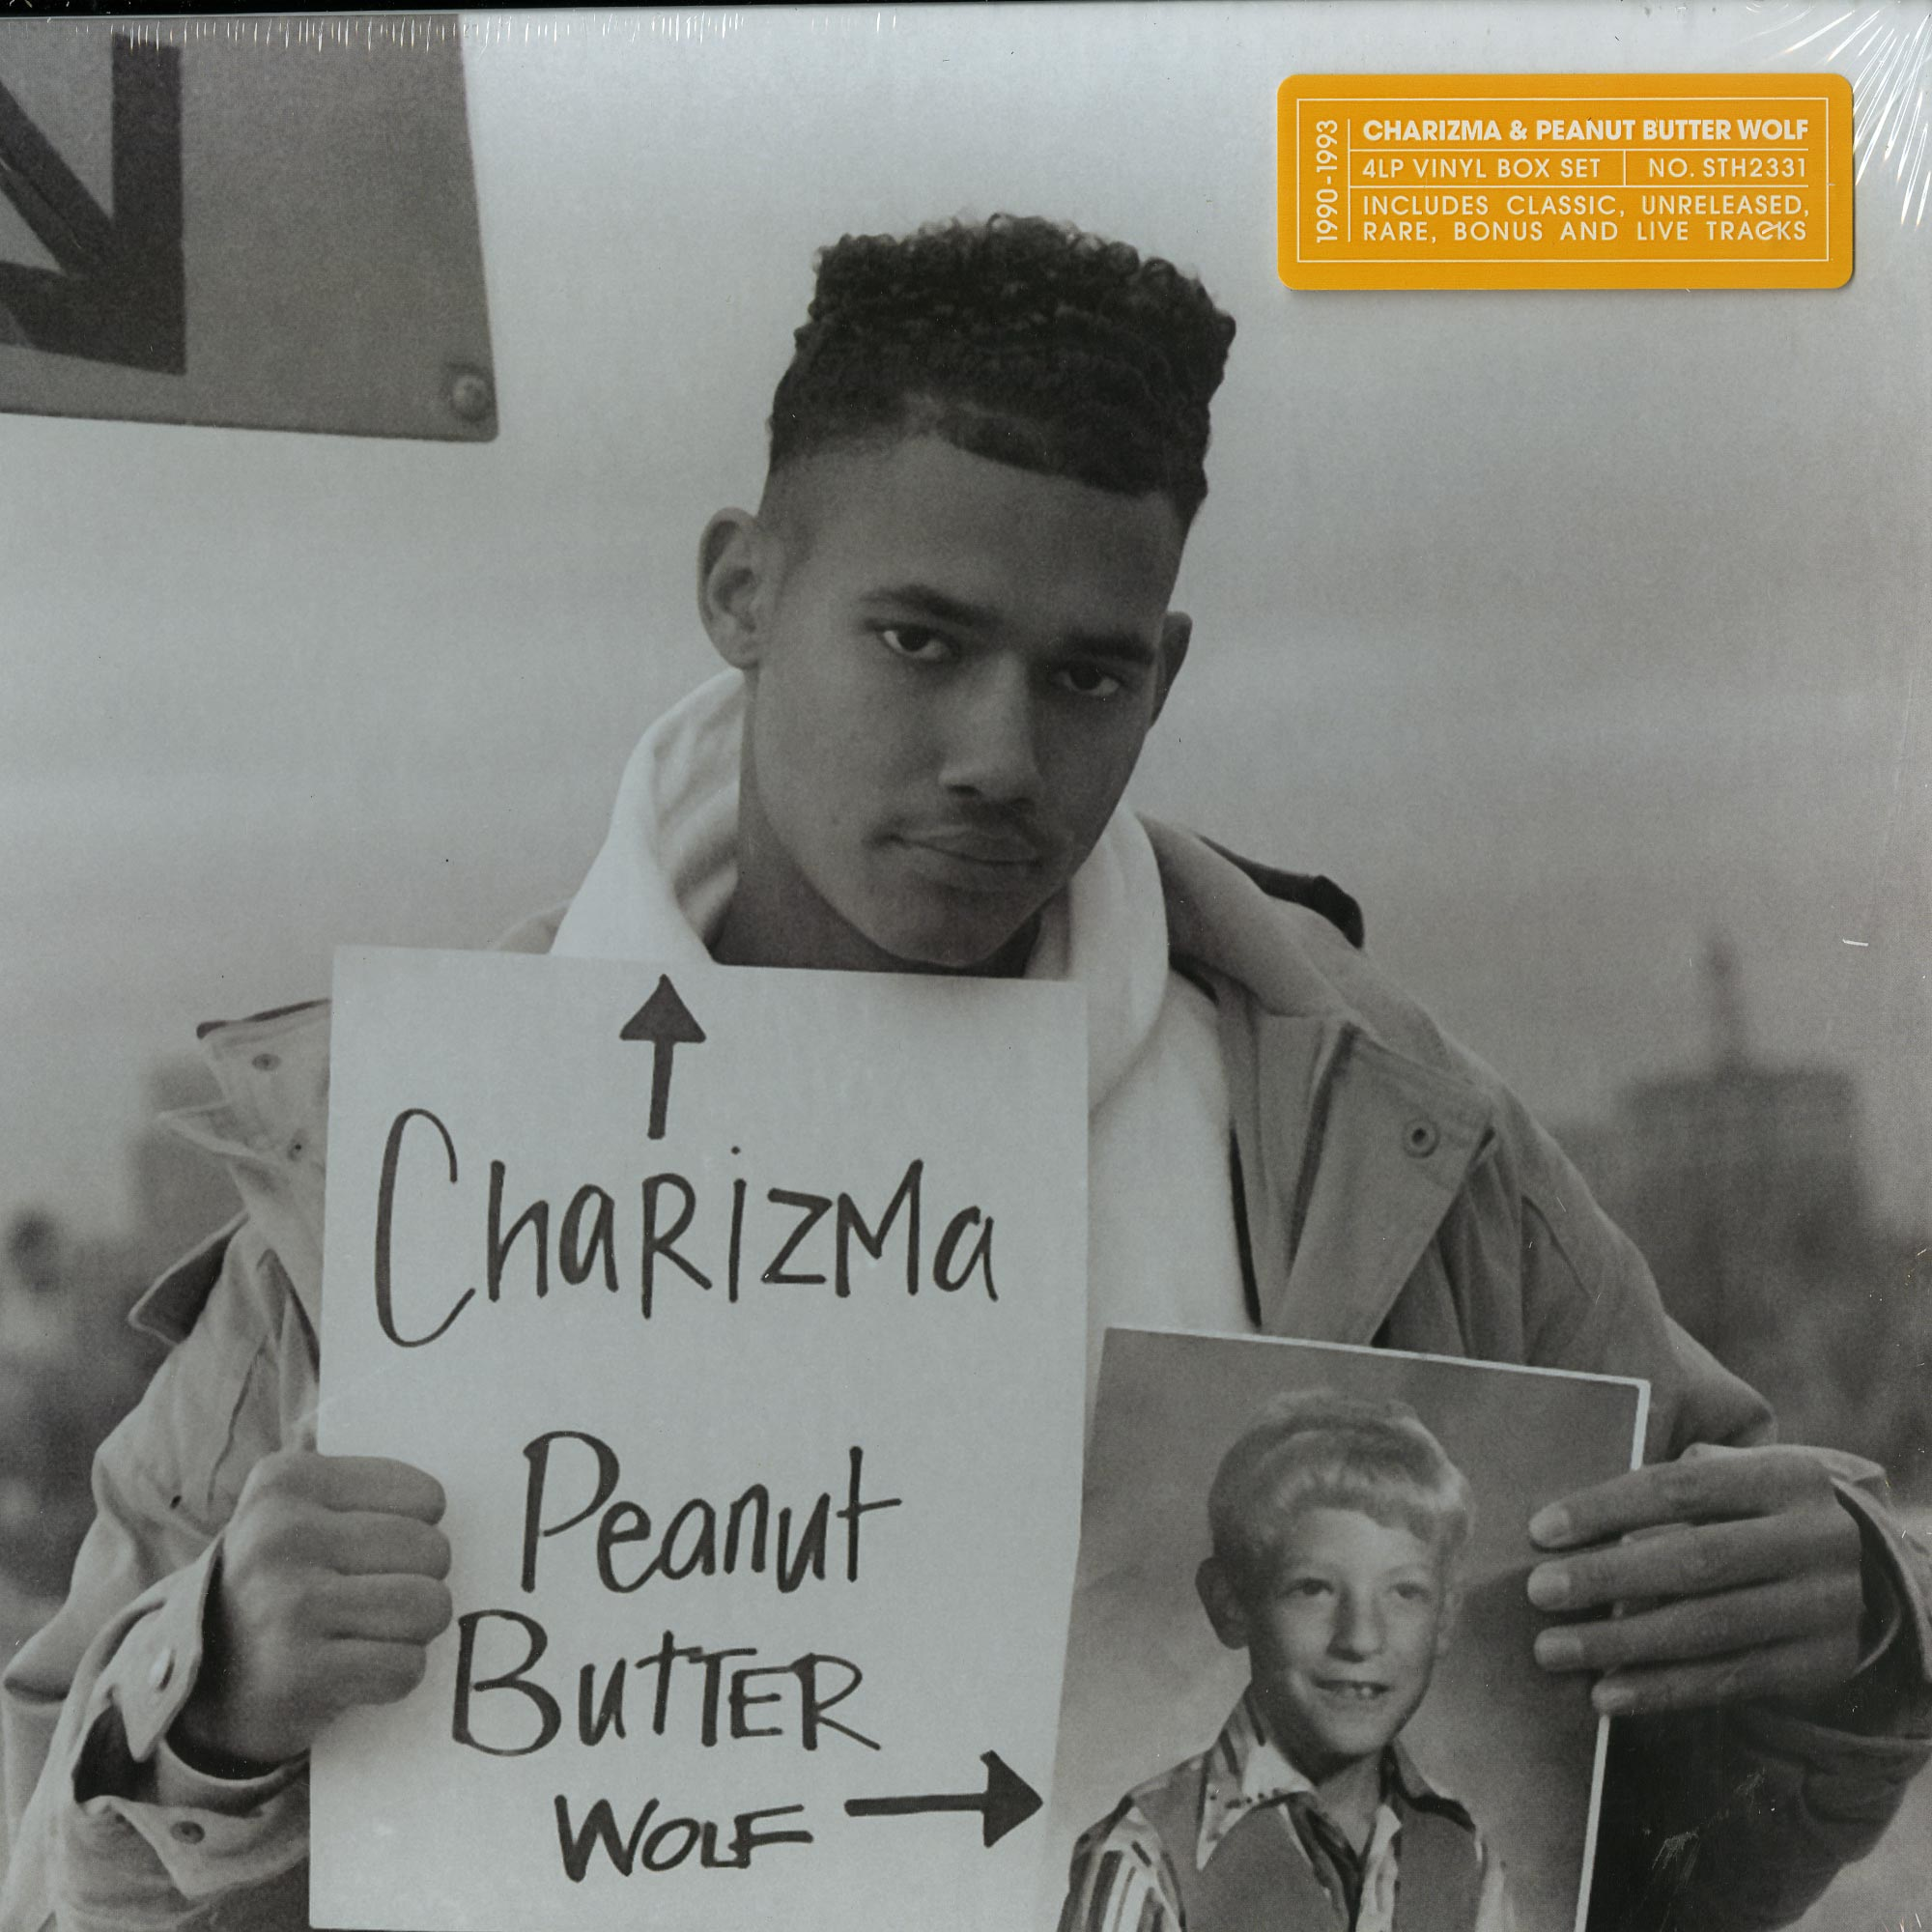 Charizma & Peanut Butter Wolf - CIRCA 1990-1993